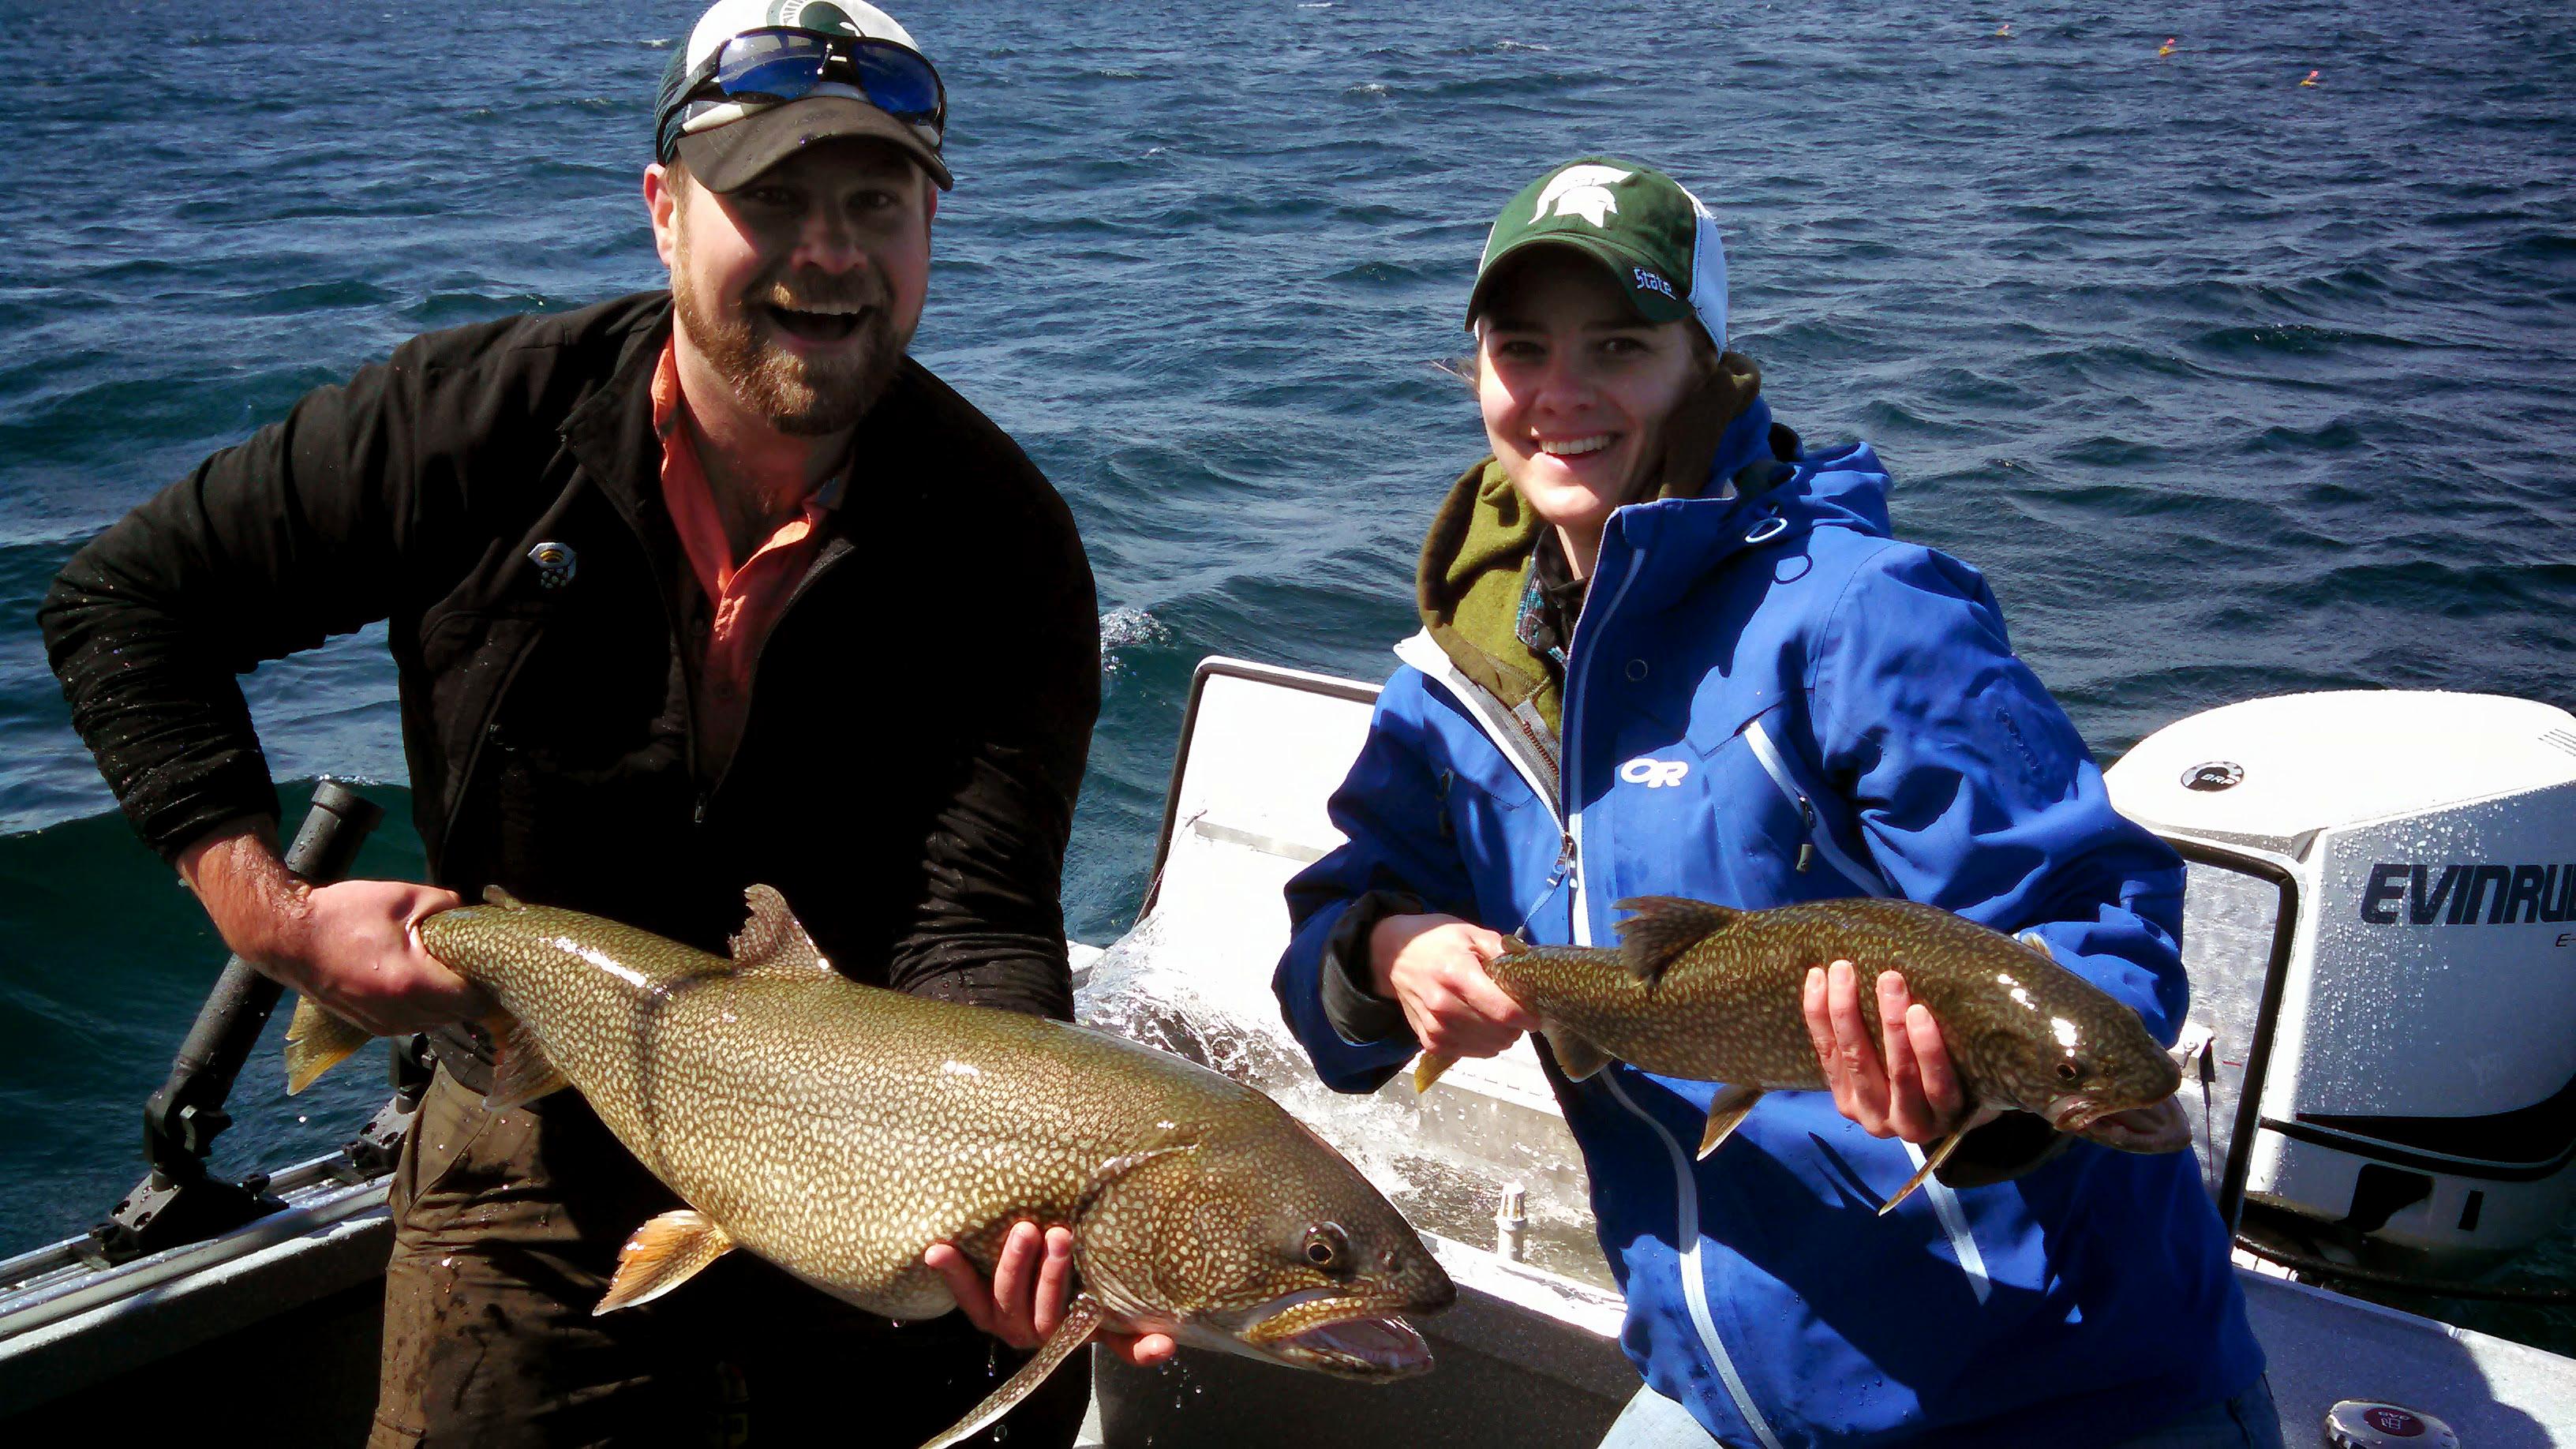 Keweenaw Charter Fishing Co.